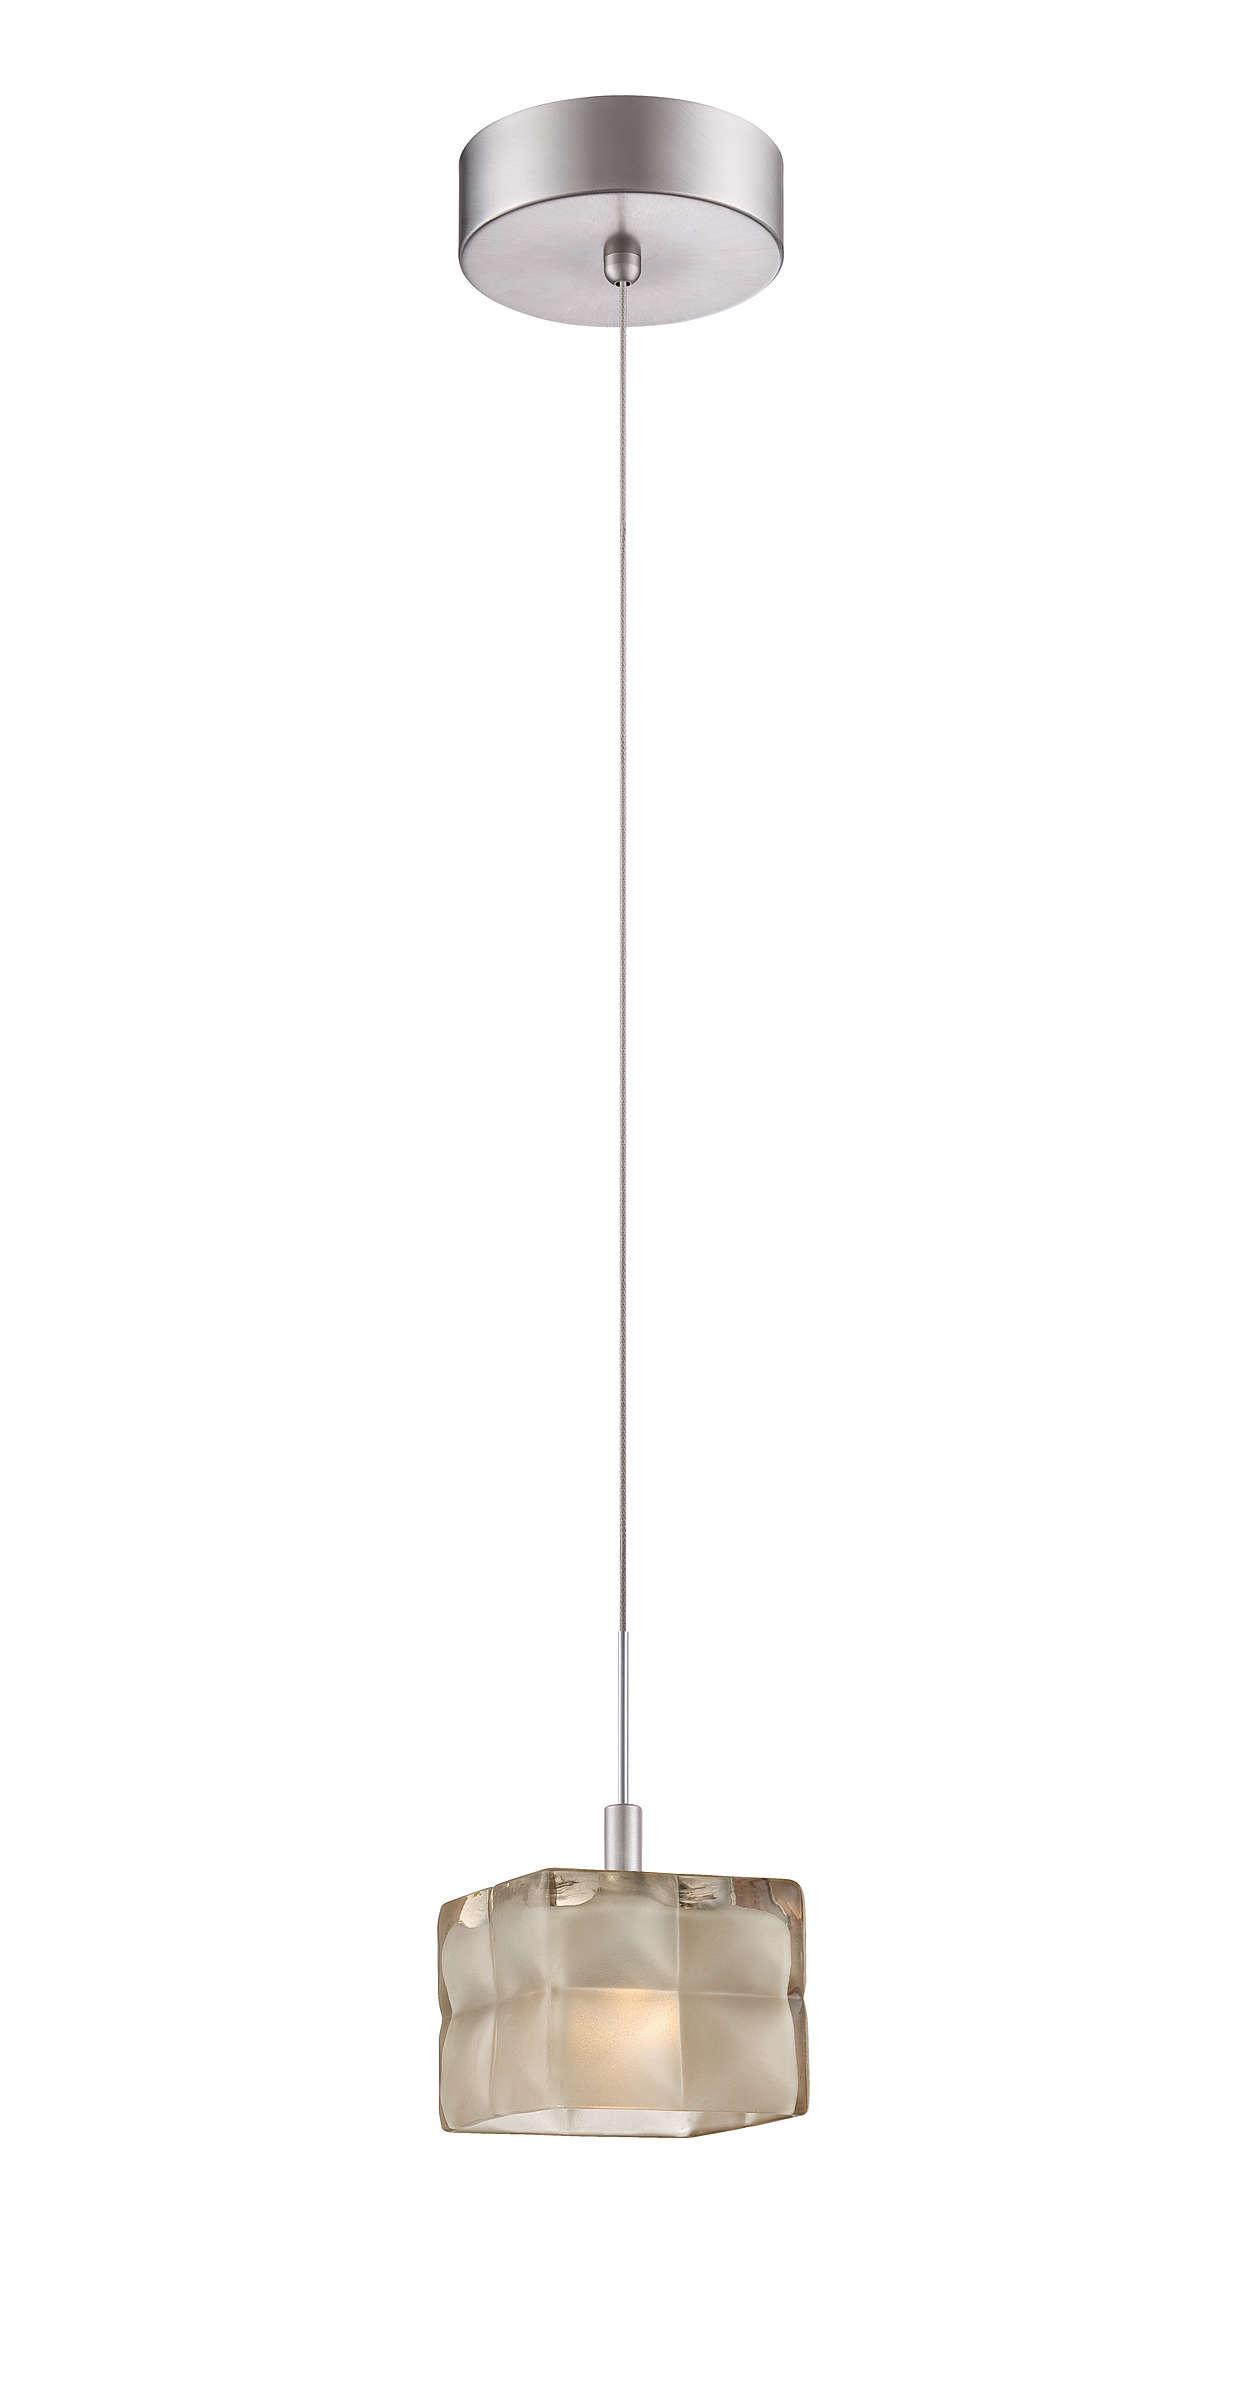 Cushion 1-light LED pendant in Satin Nickel finish